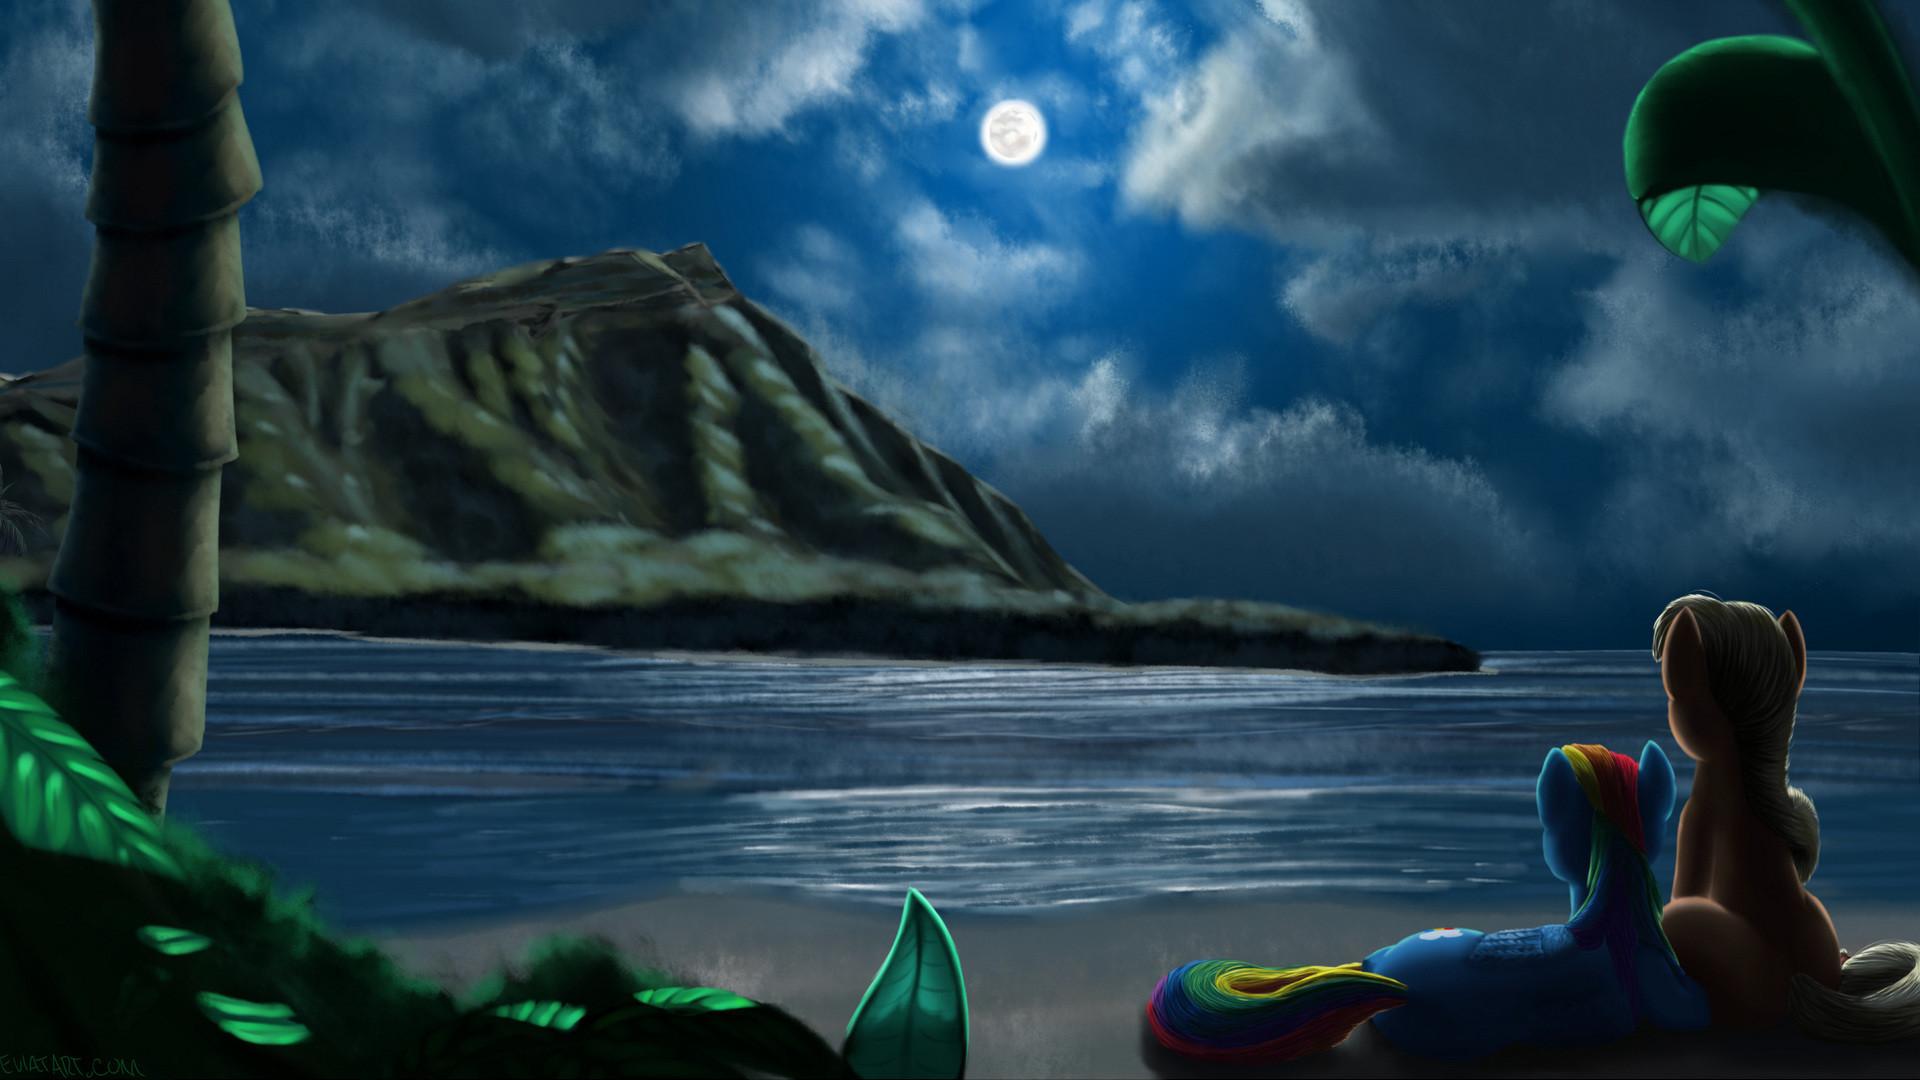 Res: 1920x1080, Download now full hd wallpaper unicorn romantic beach moon ...